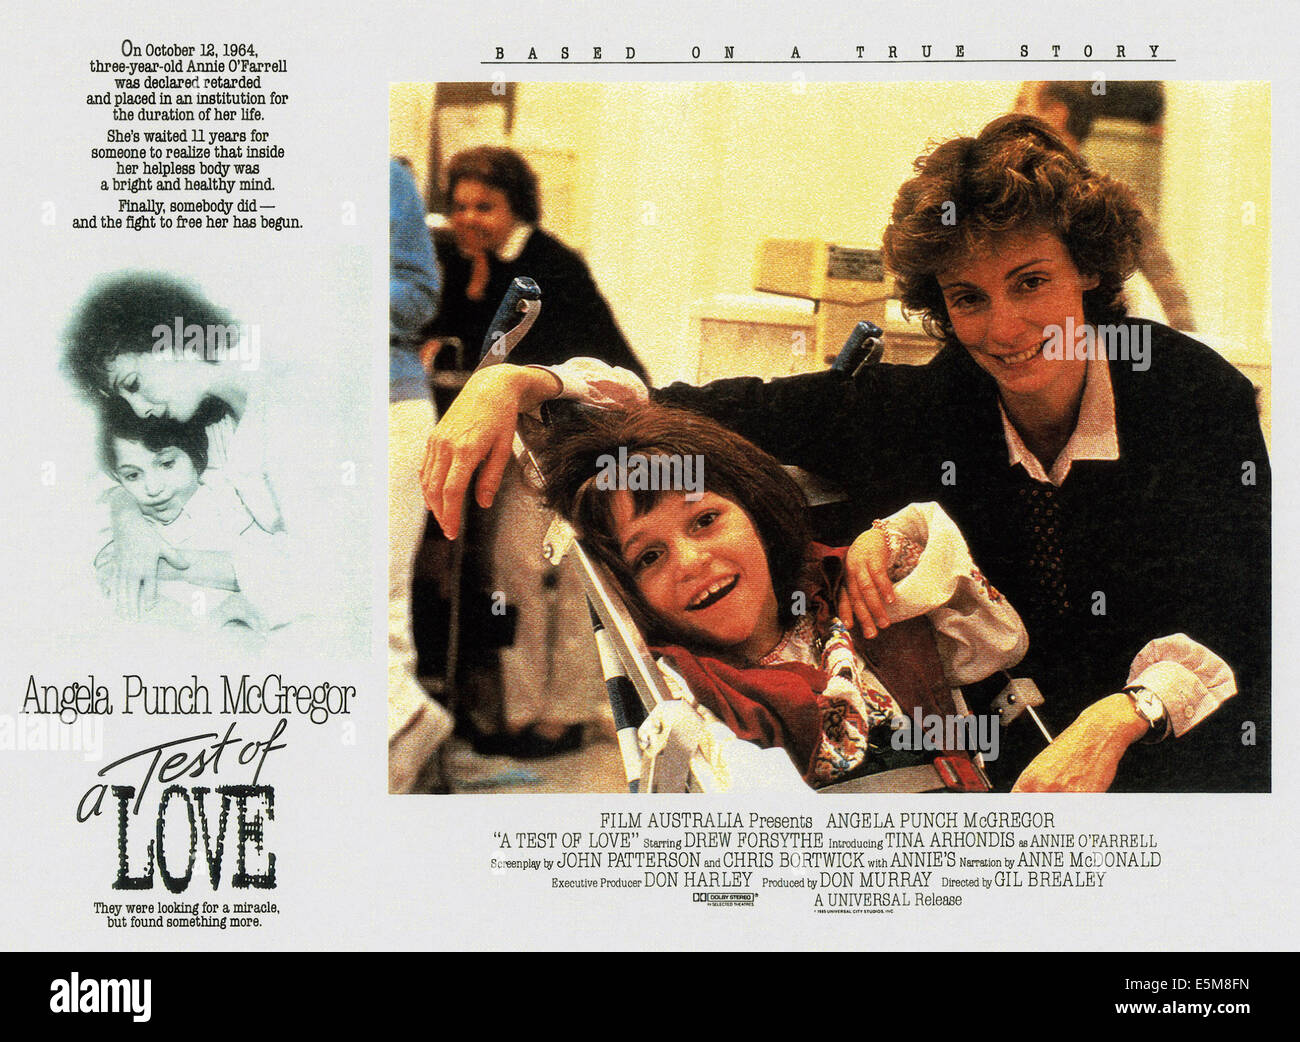 Melanie Fullerton,Danita Paner (b. 1989) XXX fotos Emily Sandberg,Samantha Noble